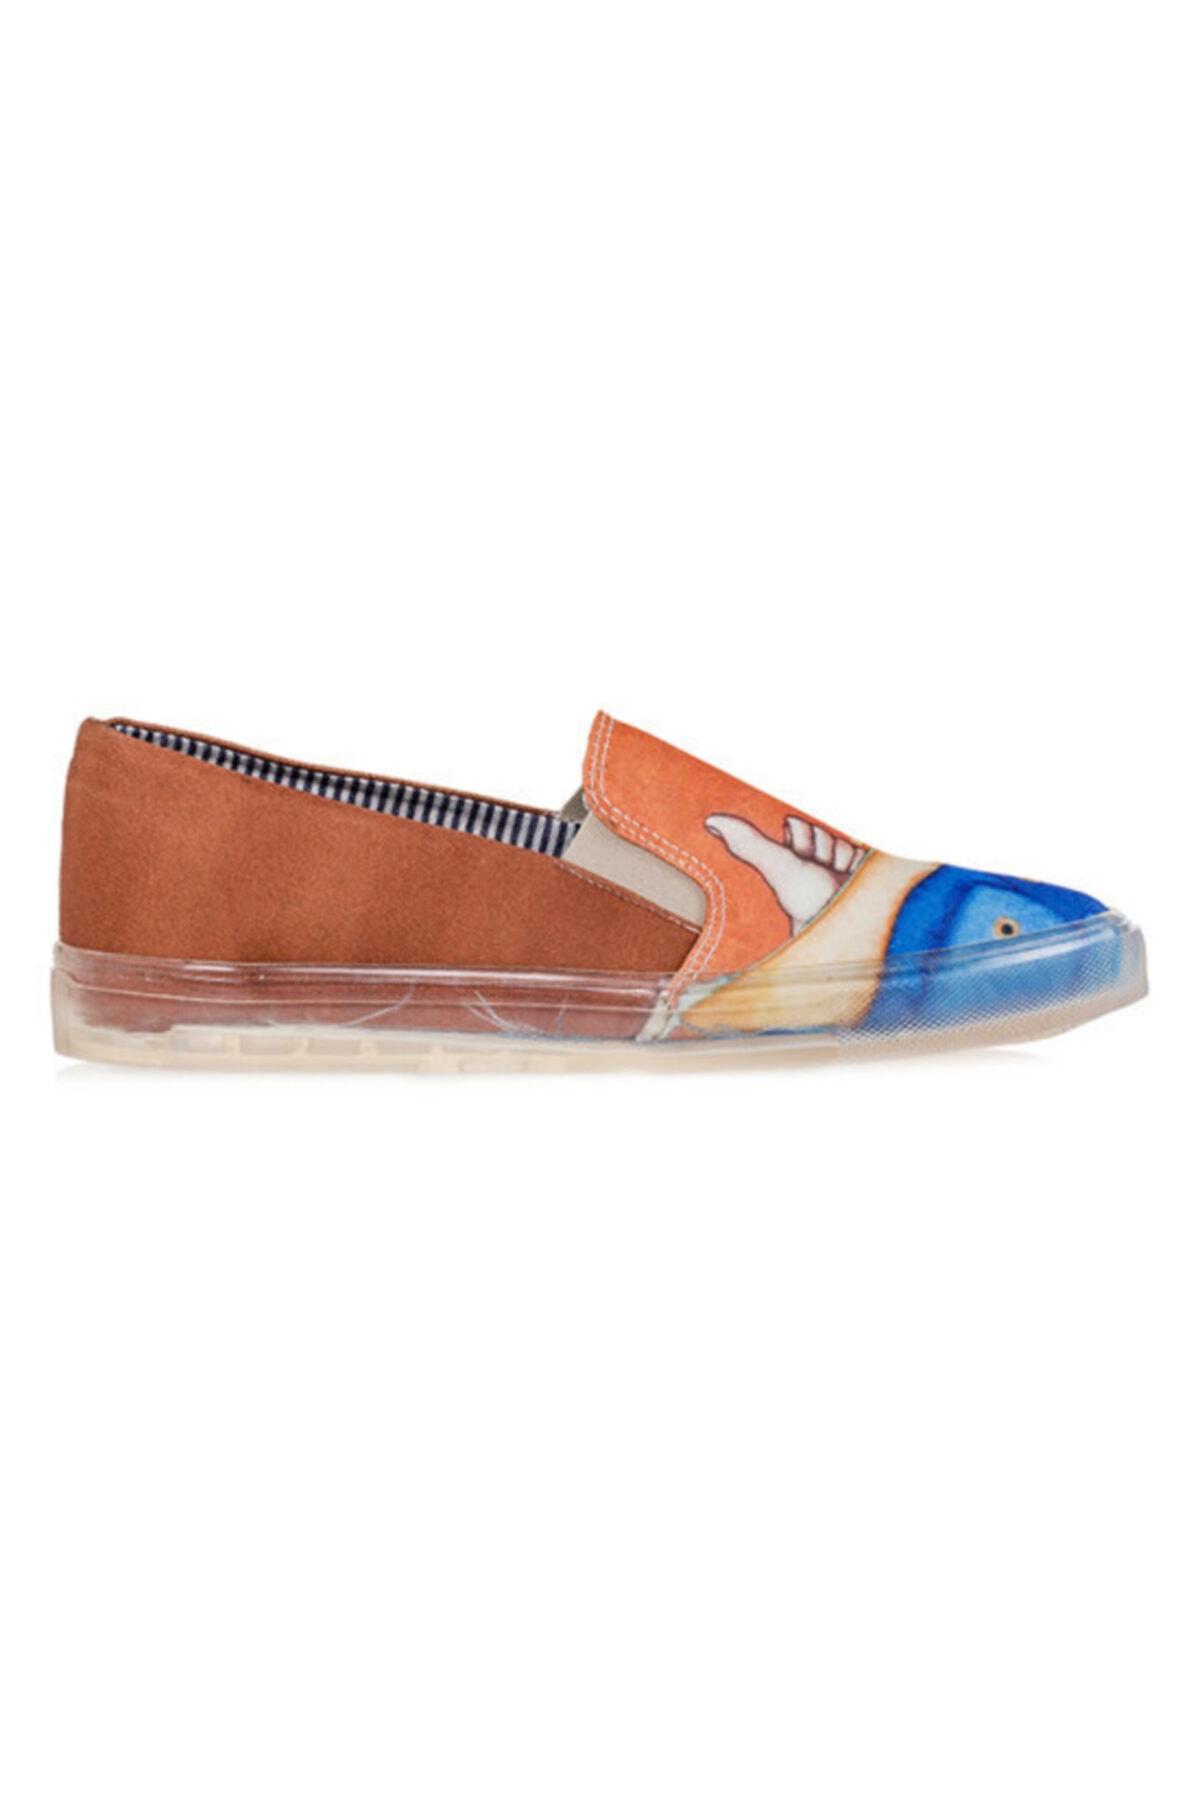 Biggdesign Erkek Kahverengi Mr. Allright Desenli Ayakkabı 1